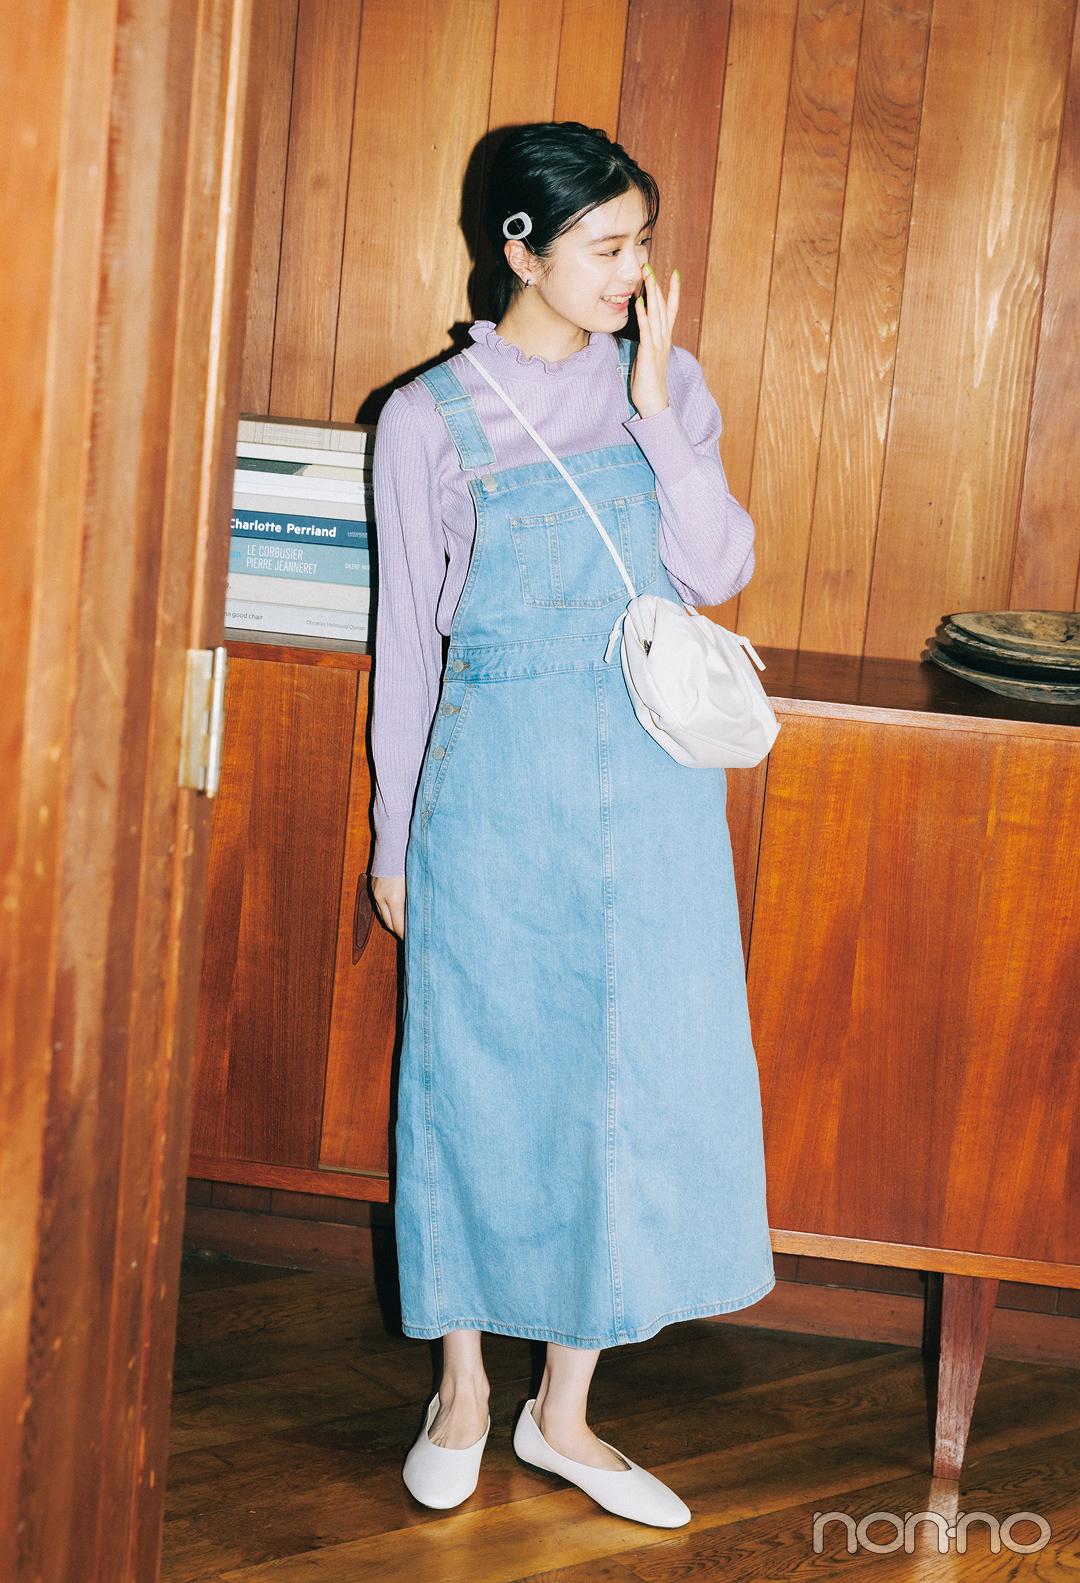 Photo Gallery モデル&女優として活躍中! 無限の透明感を持つ、紺野彩夏フォトギャラリー_1_4